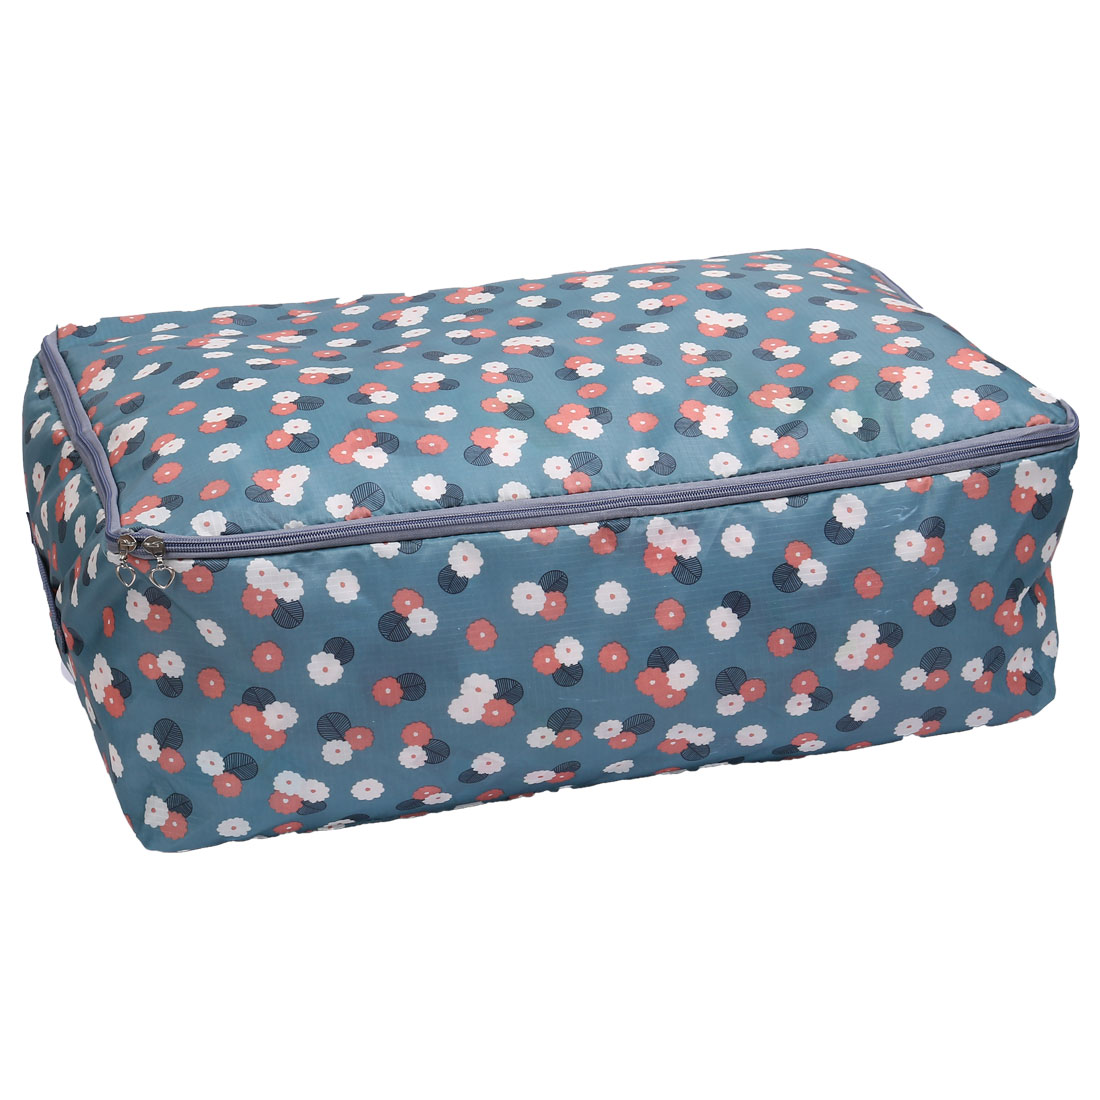 Flower Print Folding Clothes Quilts Sheet Bag Storage Organizer 58 x 40 x 22cm